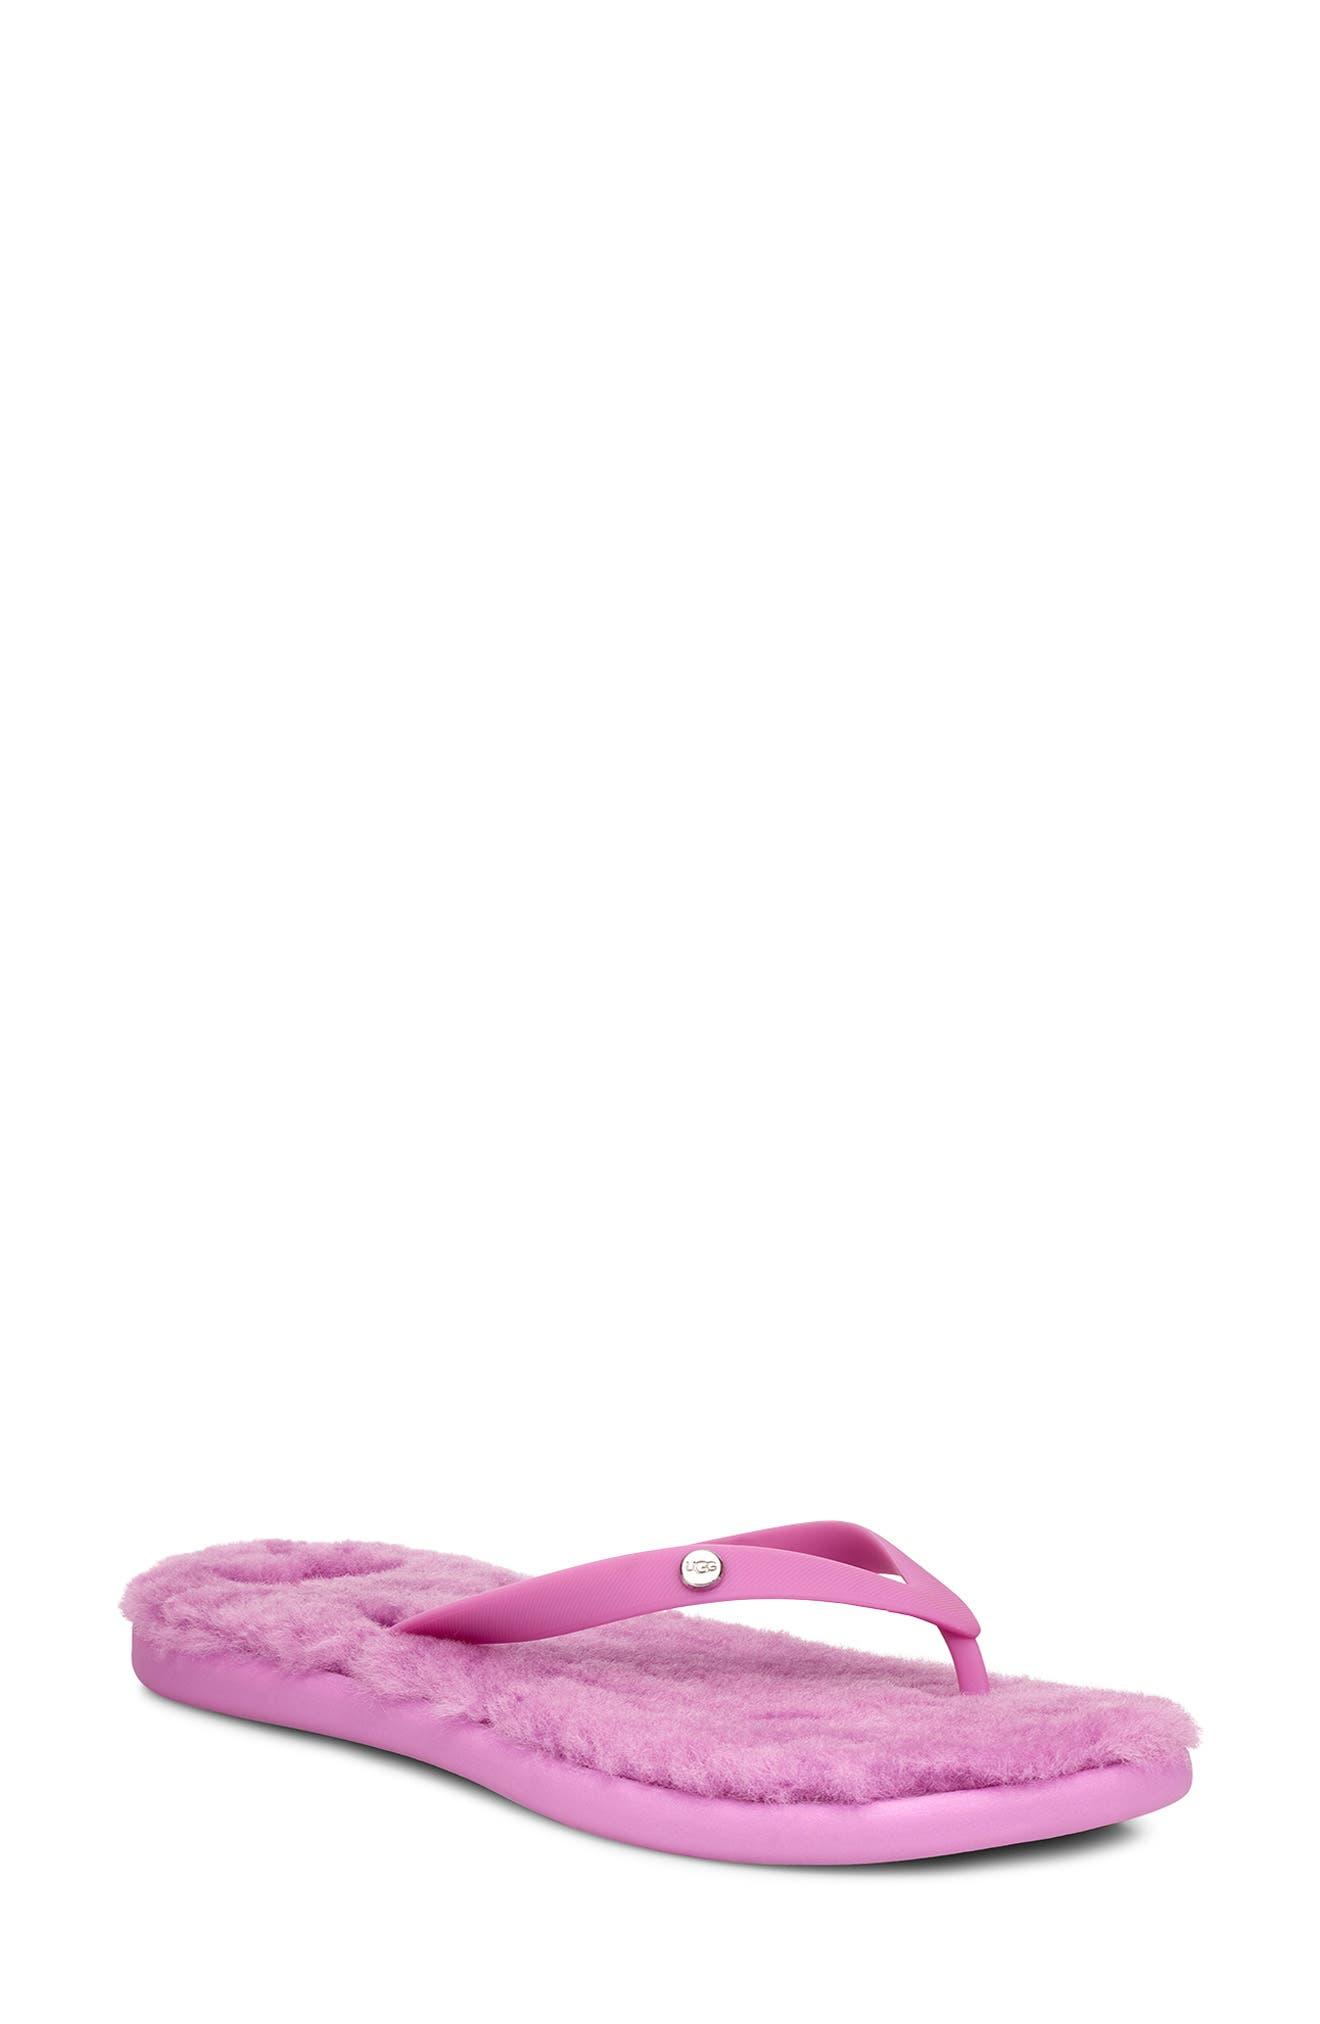 130d9b9c9 Women s Flip Flops UGG Boots   More